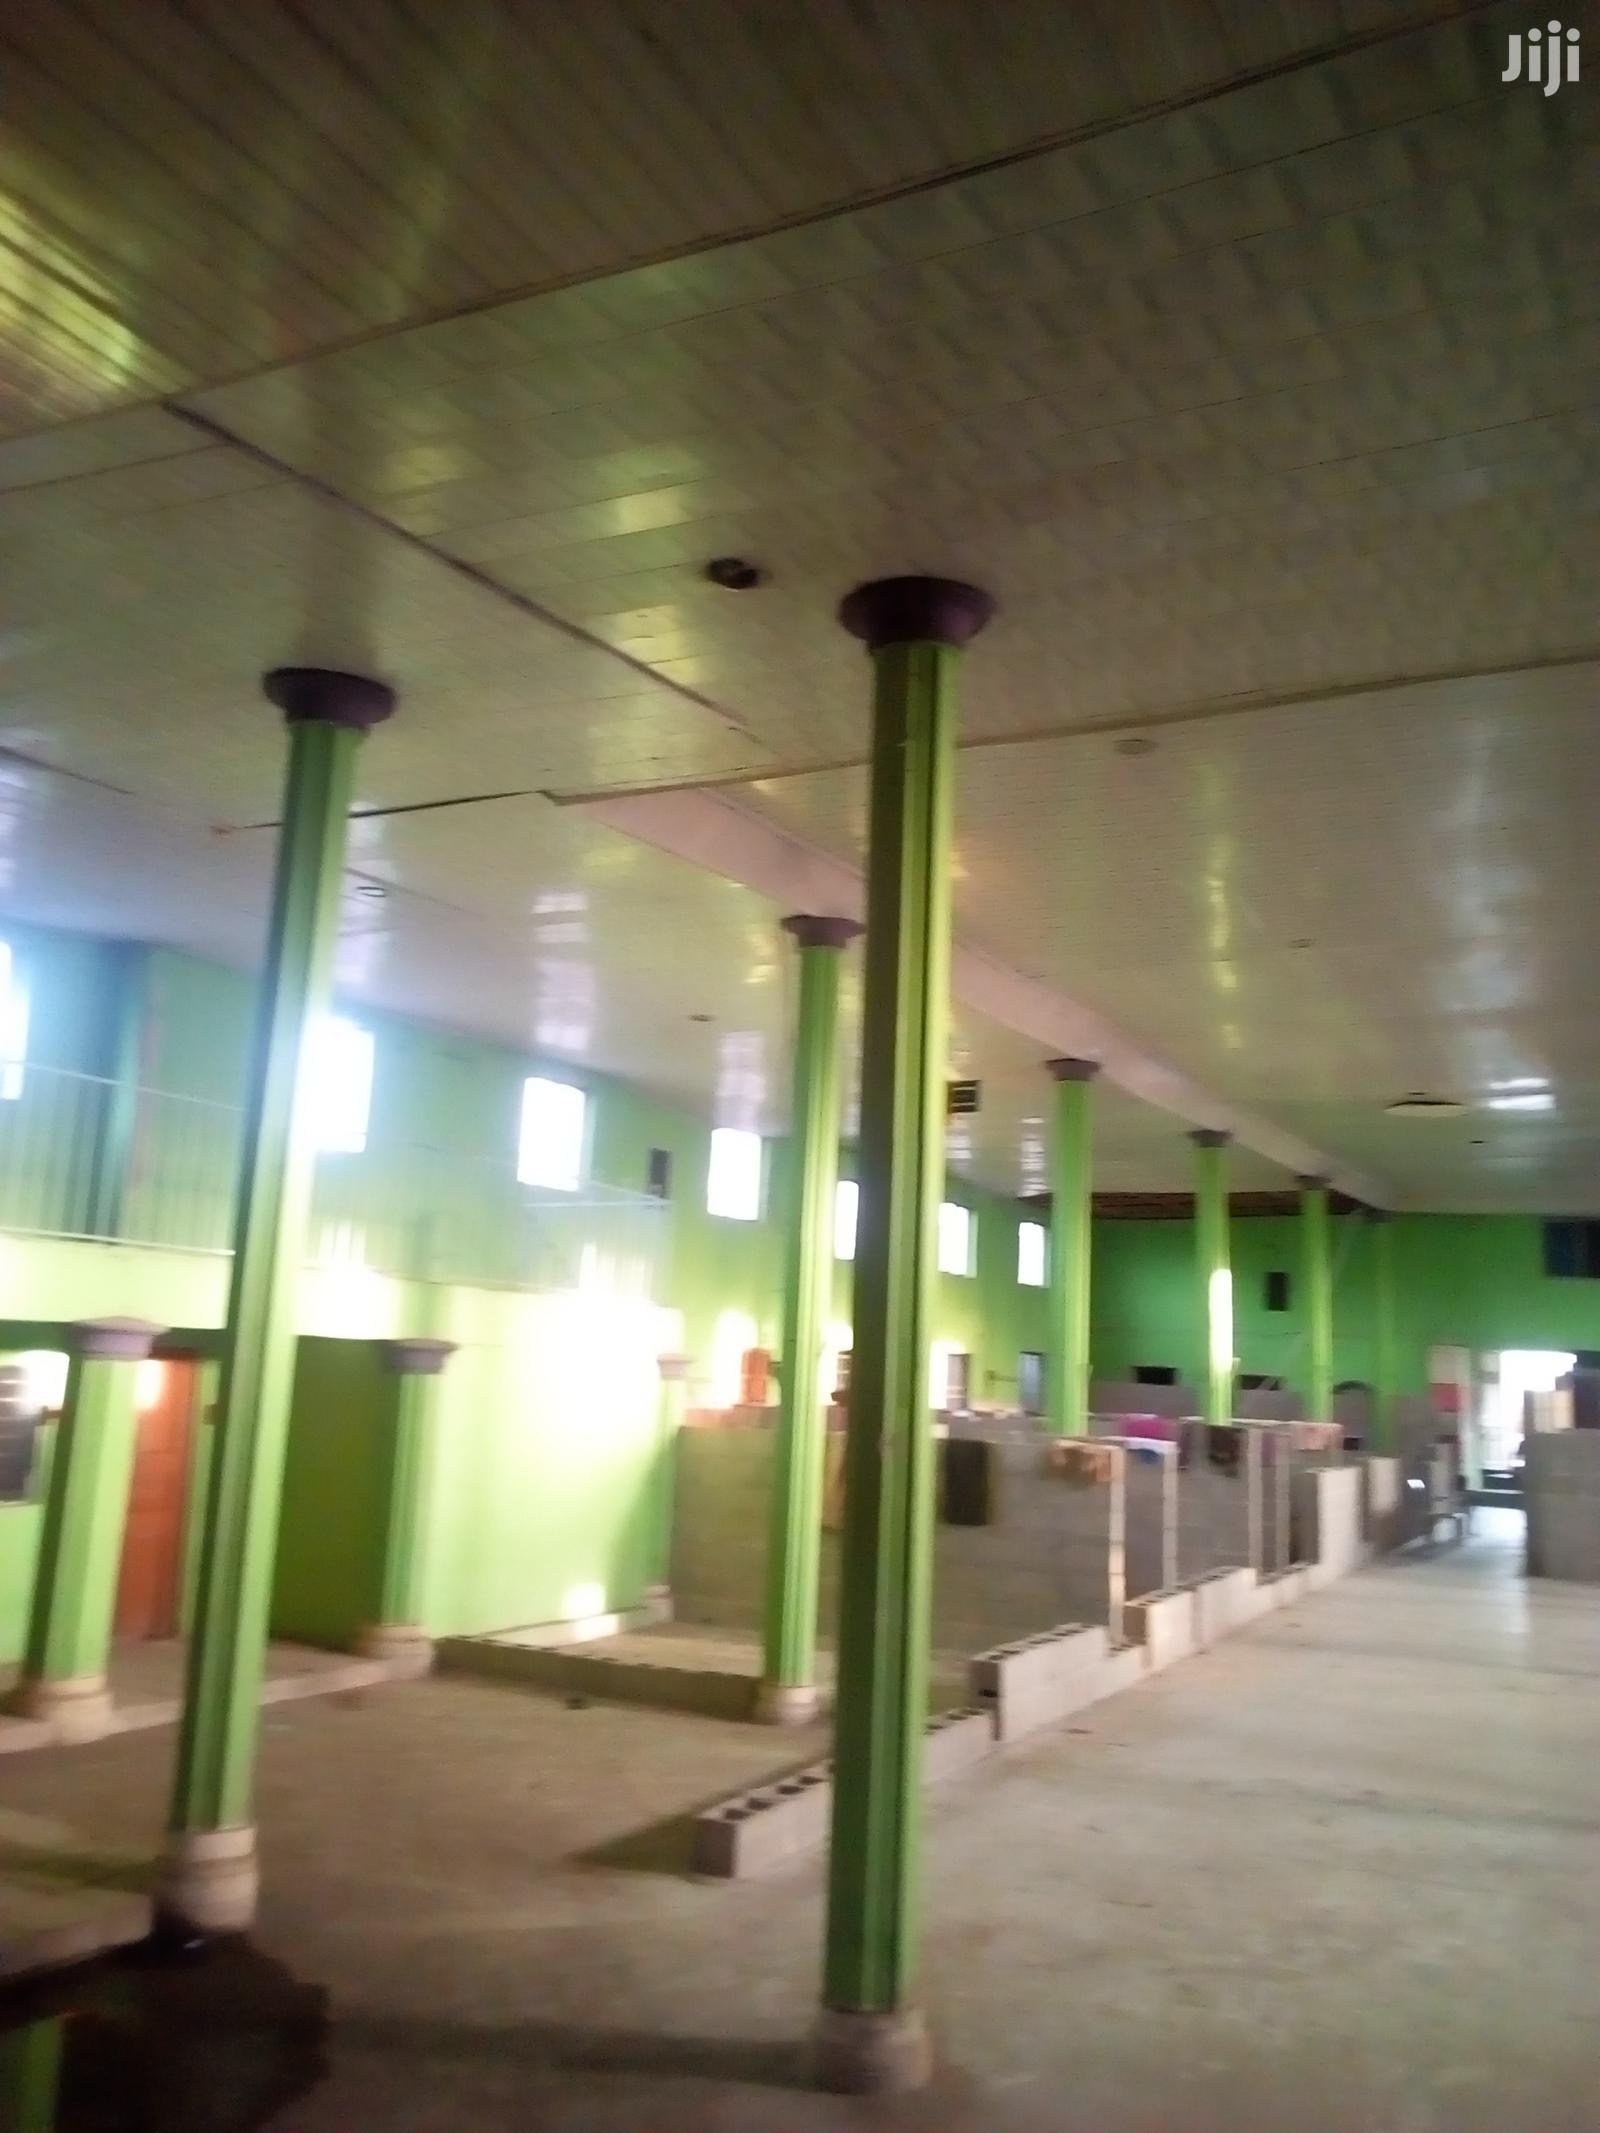 Big Auditorium/Hall For Church Use At Afromedia Okokomaiko